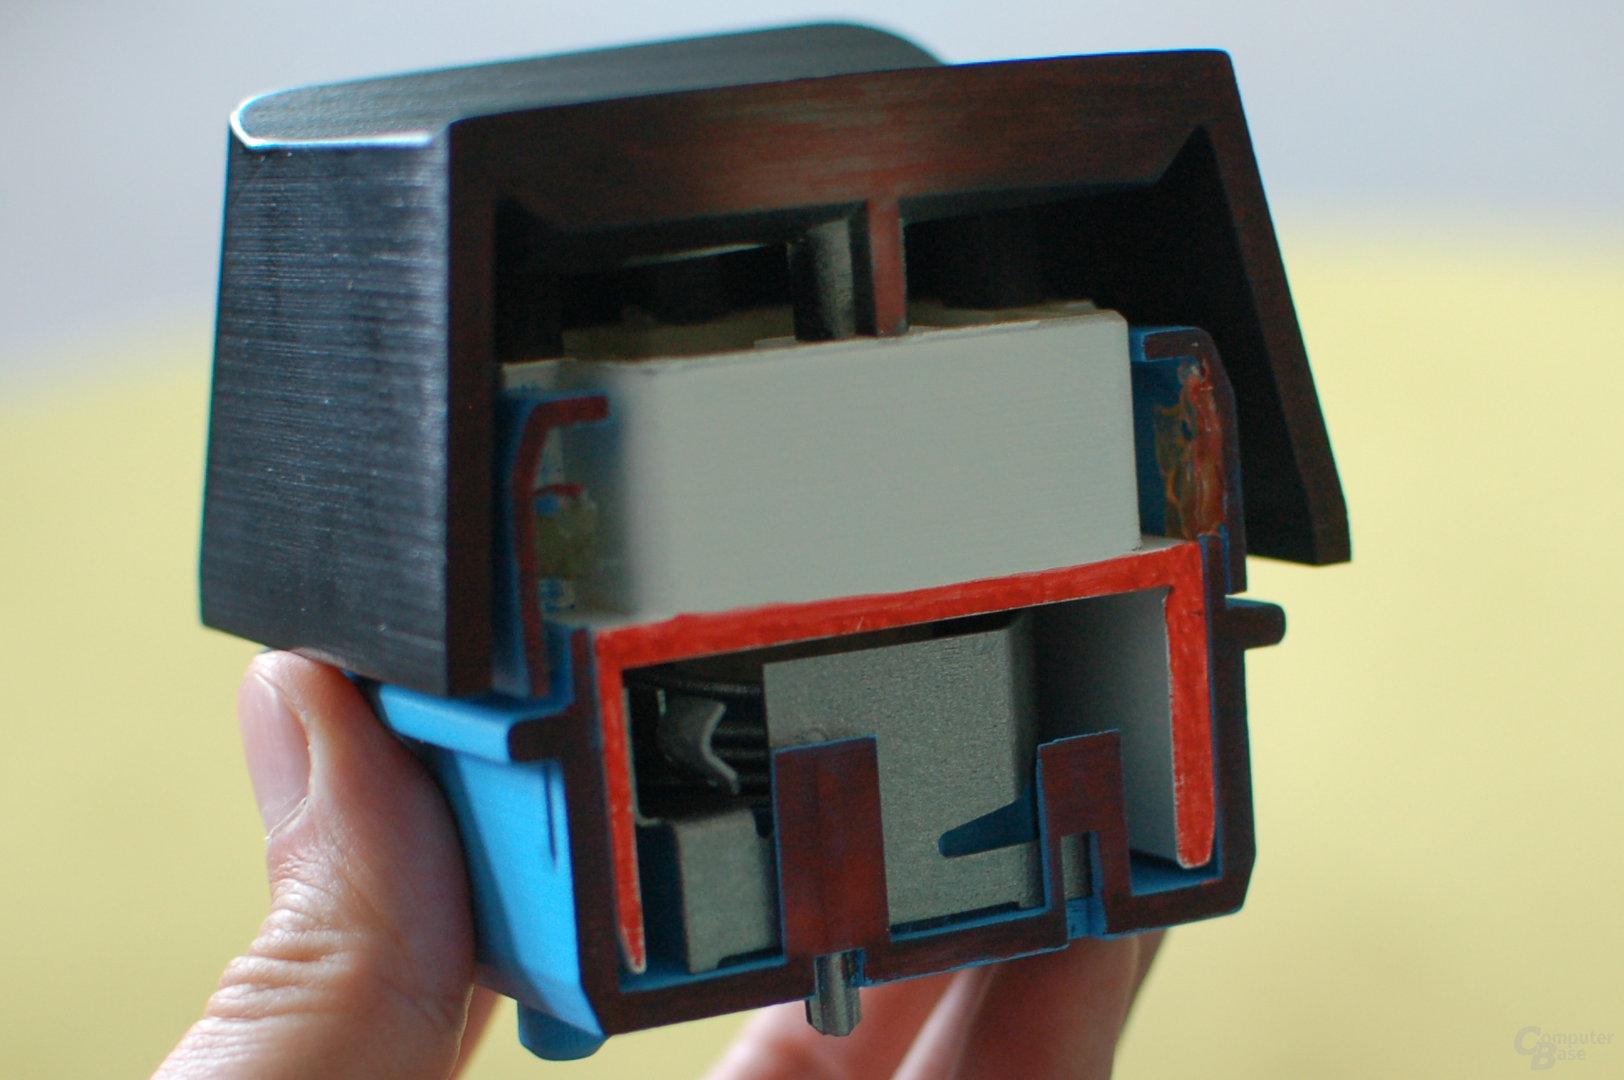 Querschnittsmodell des Romer-G-Tasters